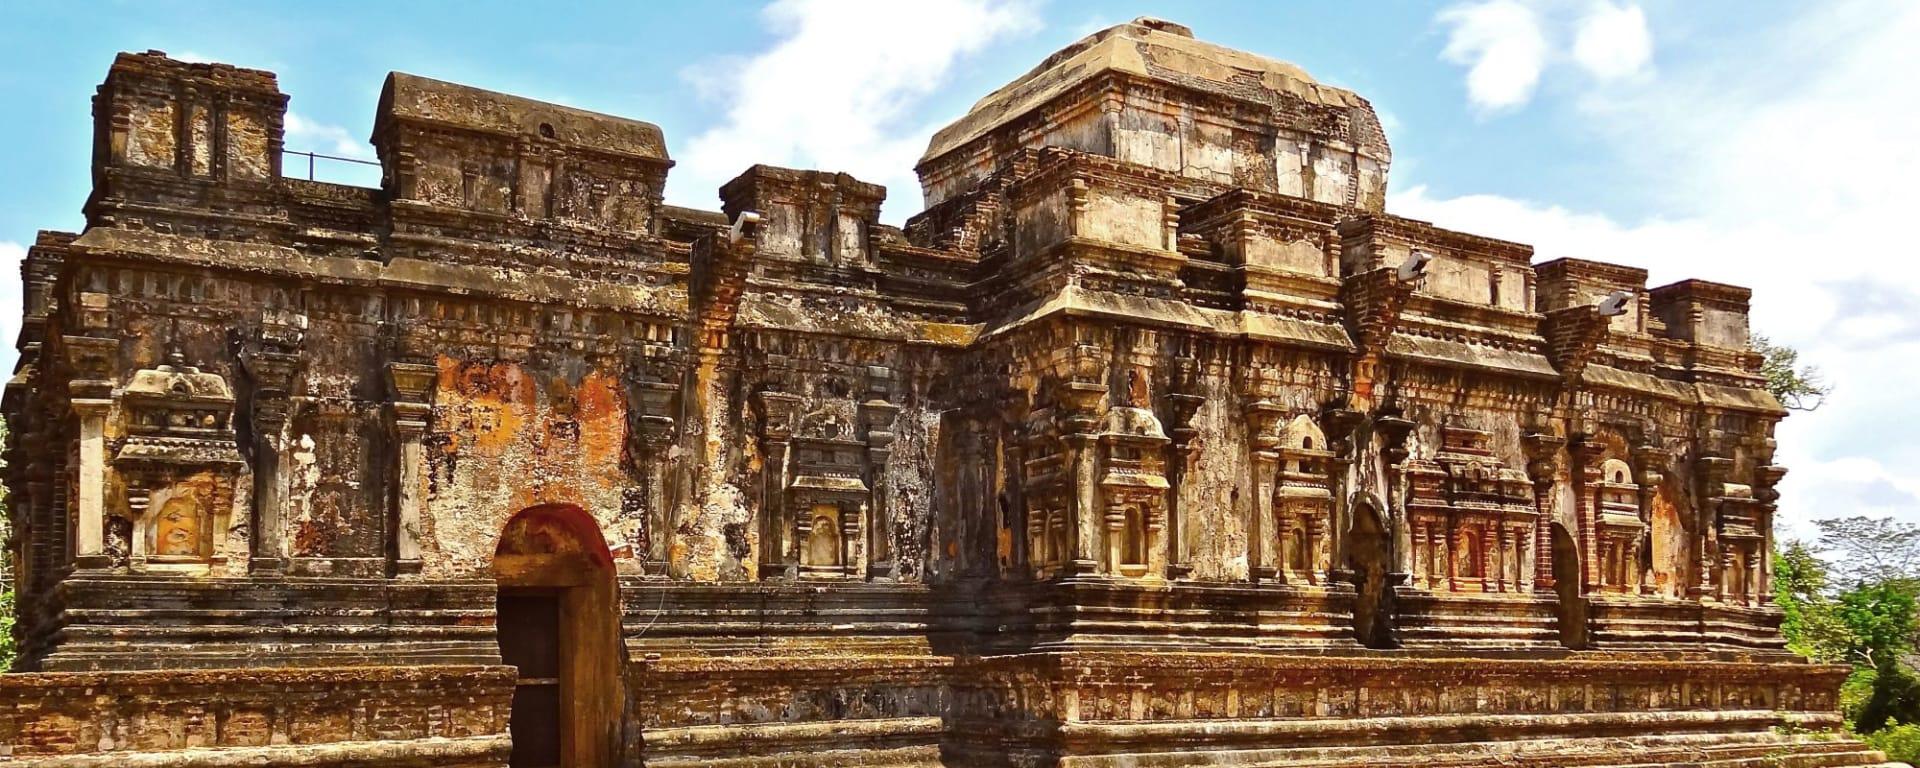 Découverte active du Sri Lanka de Colombo: Polonnaruwa: old temple ruin